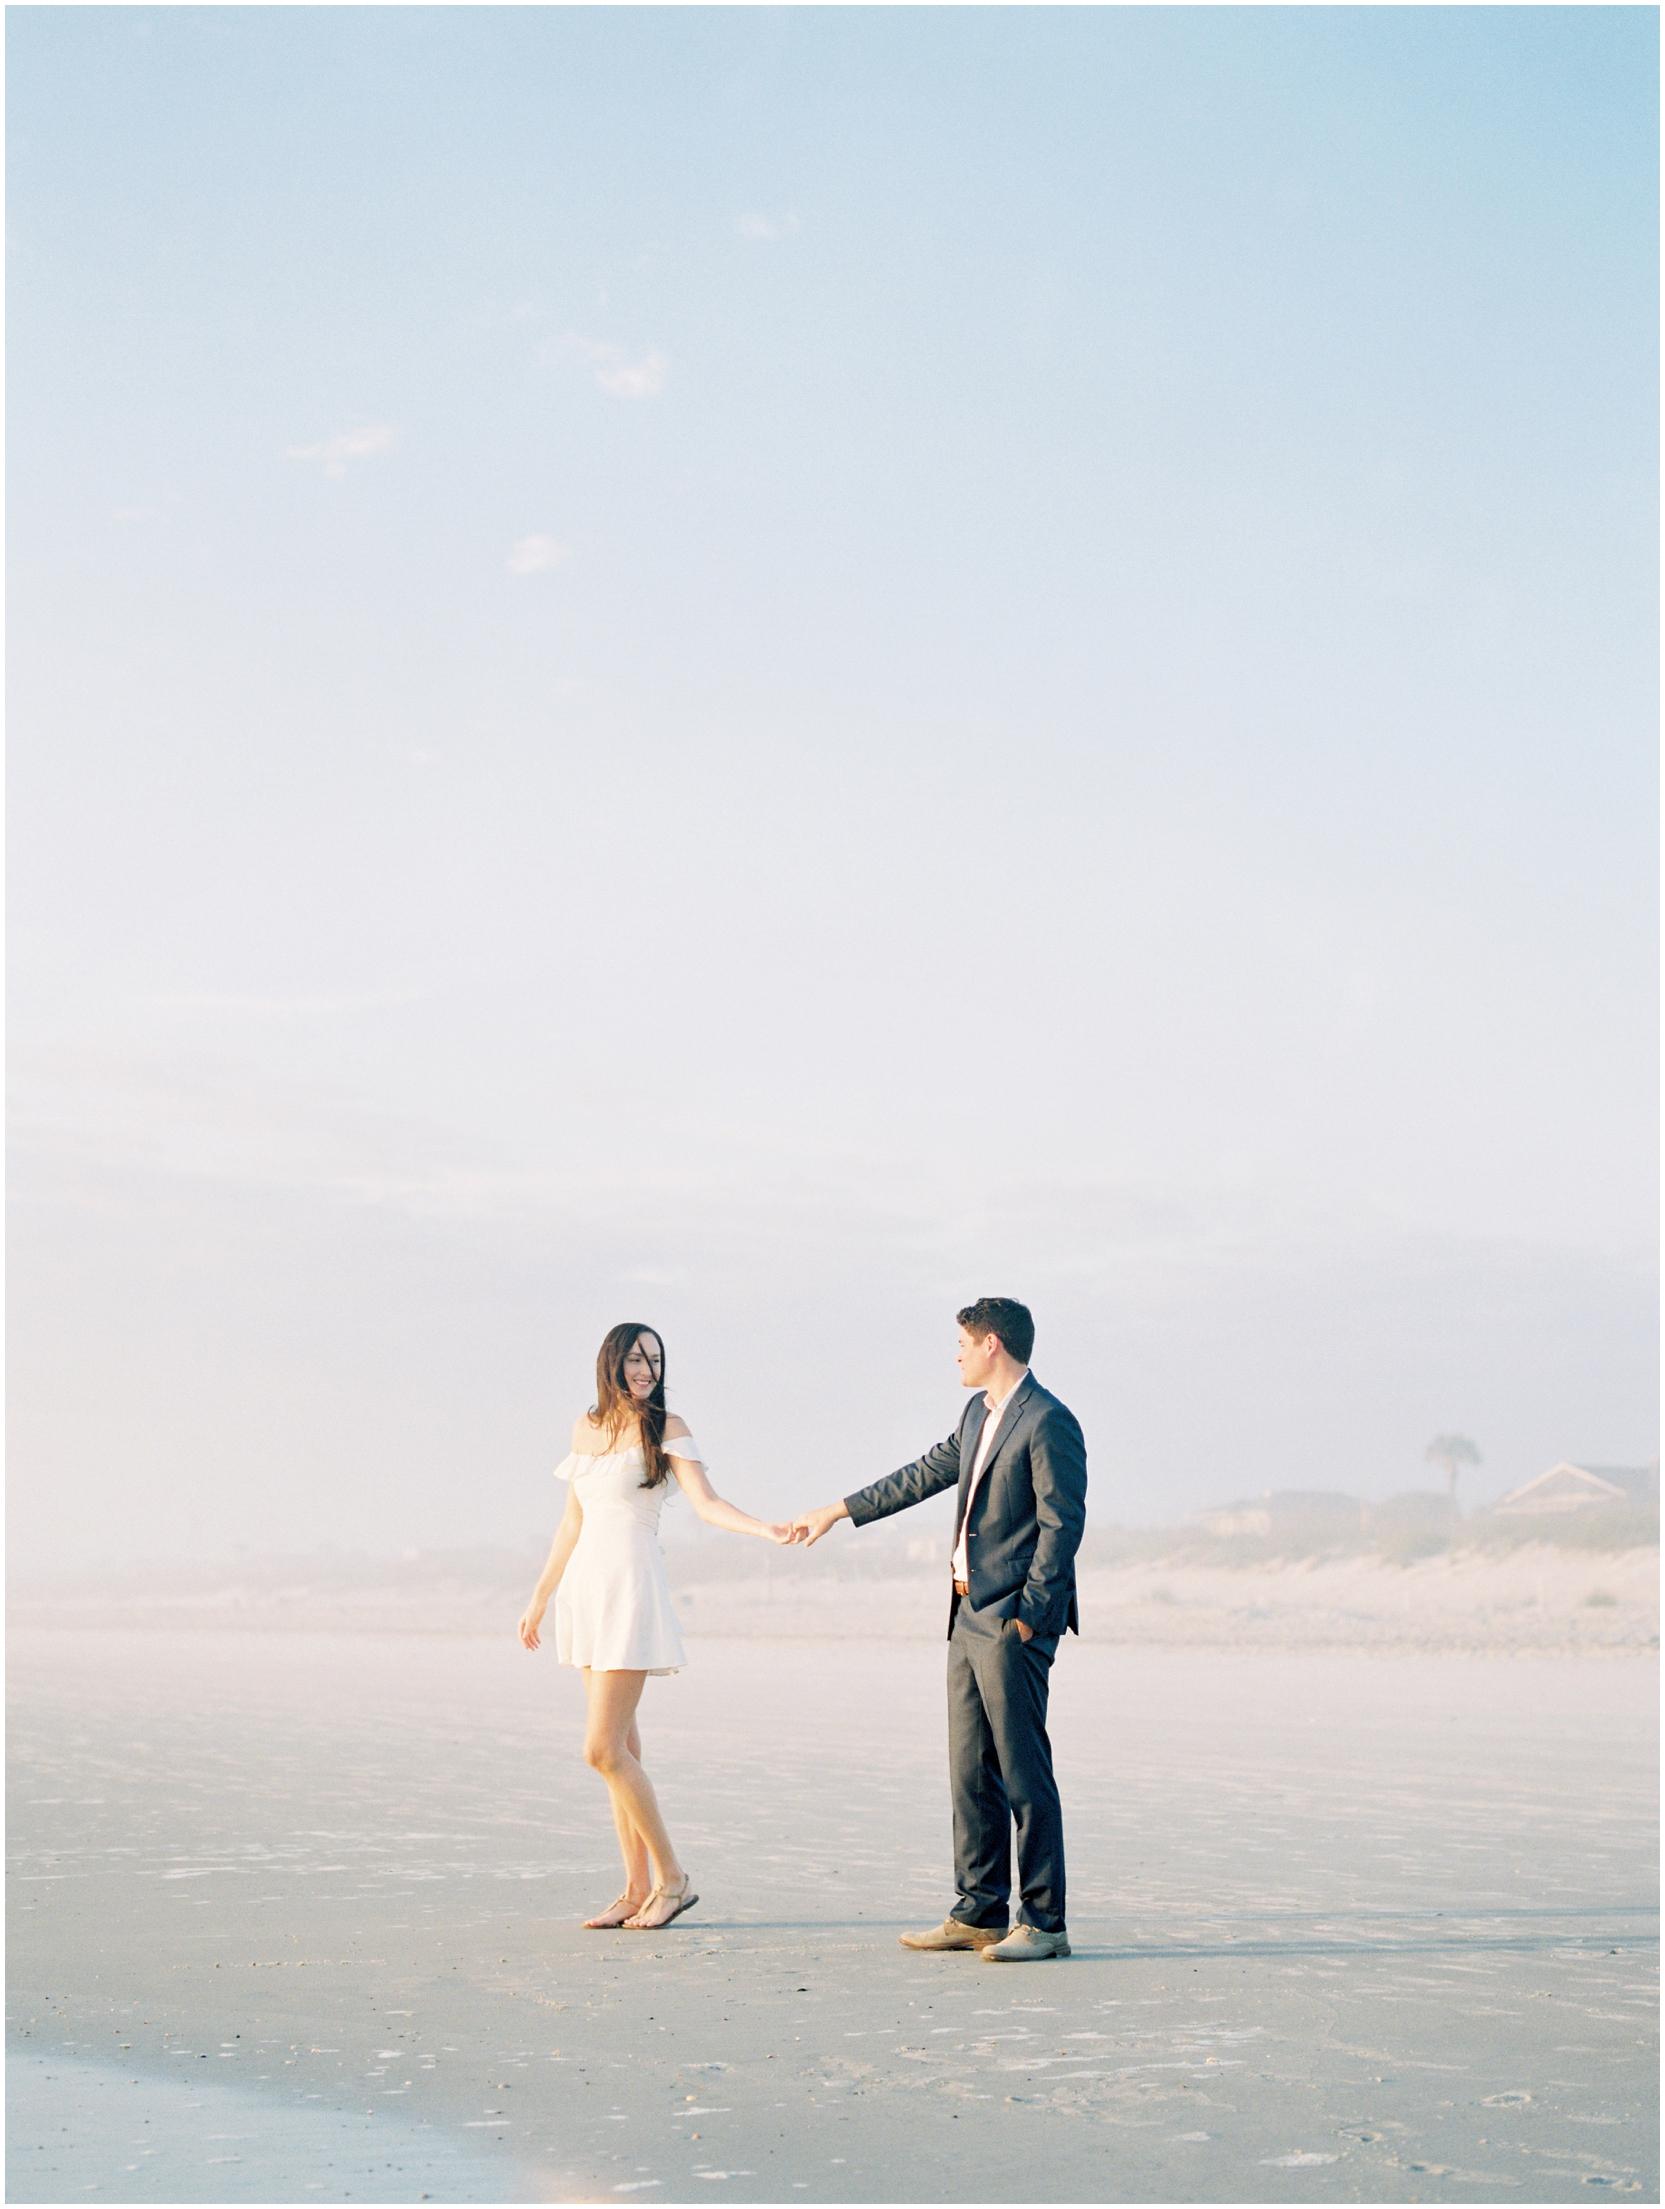 Lisa Silva Photography -Engagement Session at Neptune Beach, Florida- Jacksonville and North East Florida Fine Art Film Photographer_0012.jpg